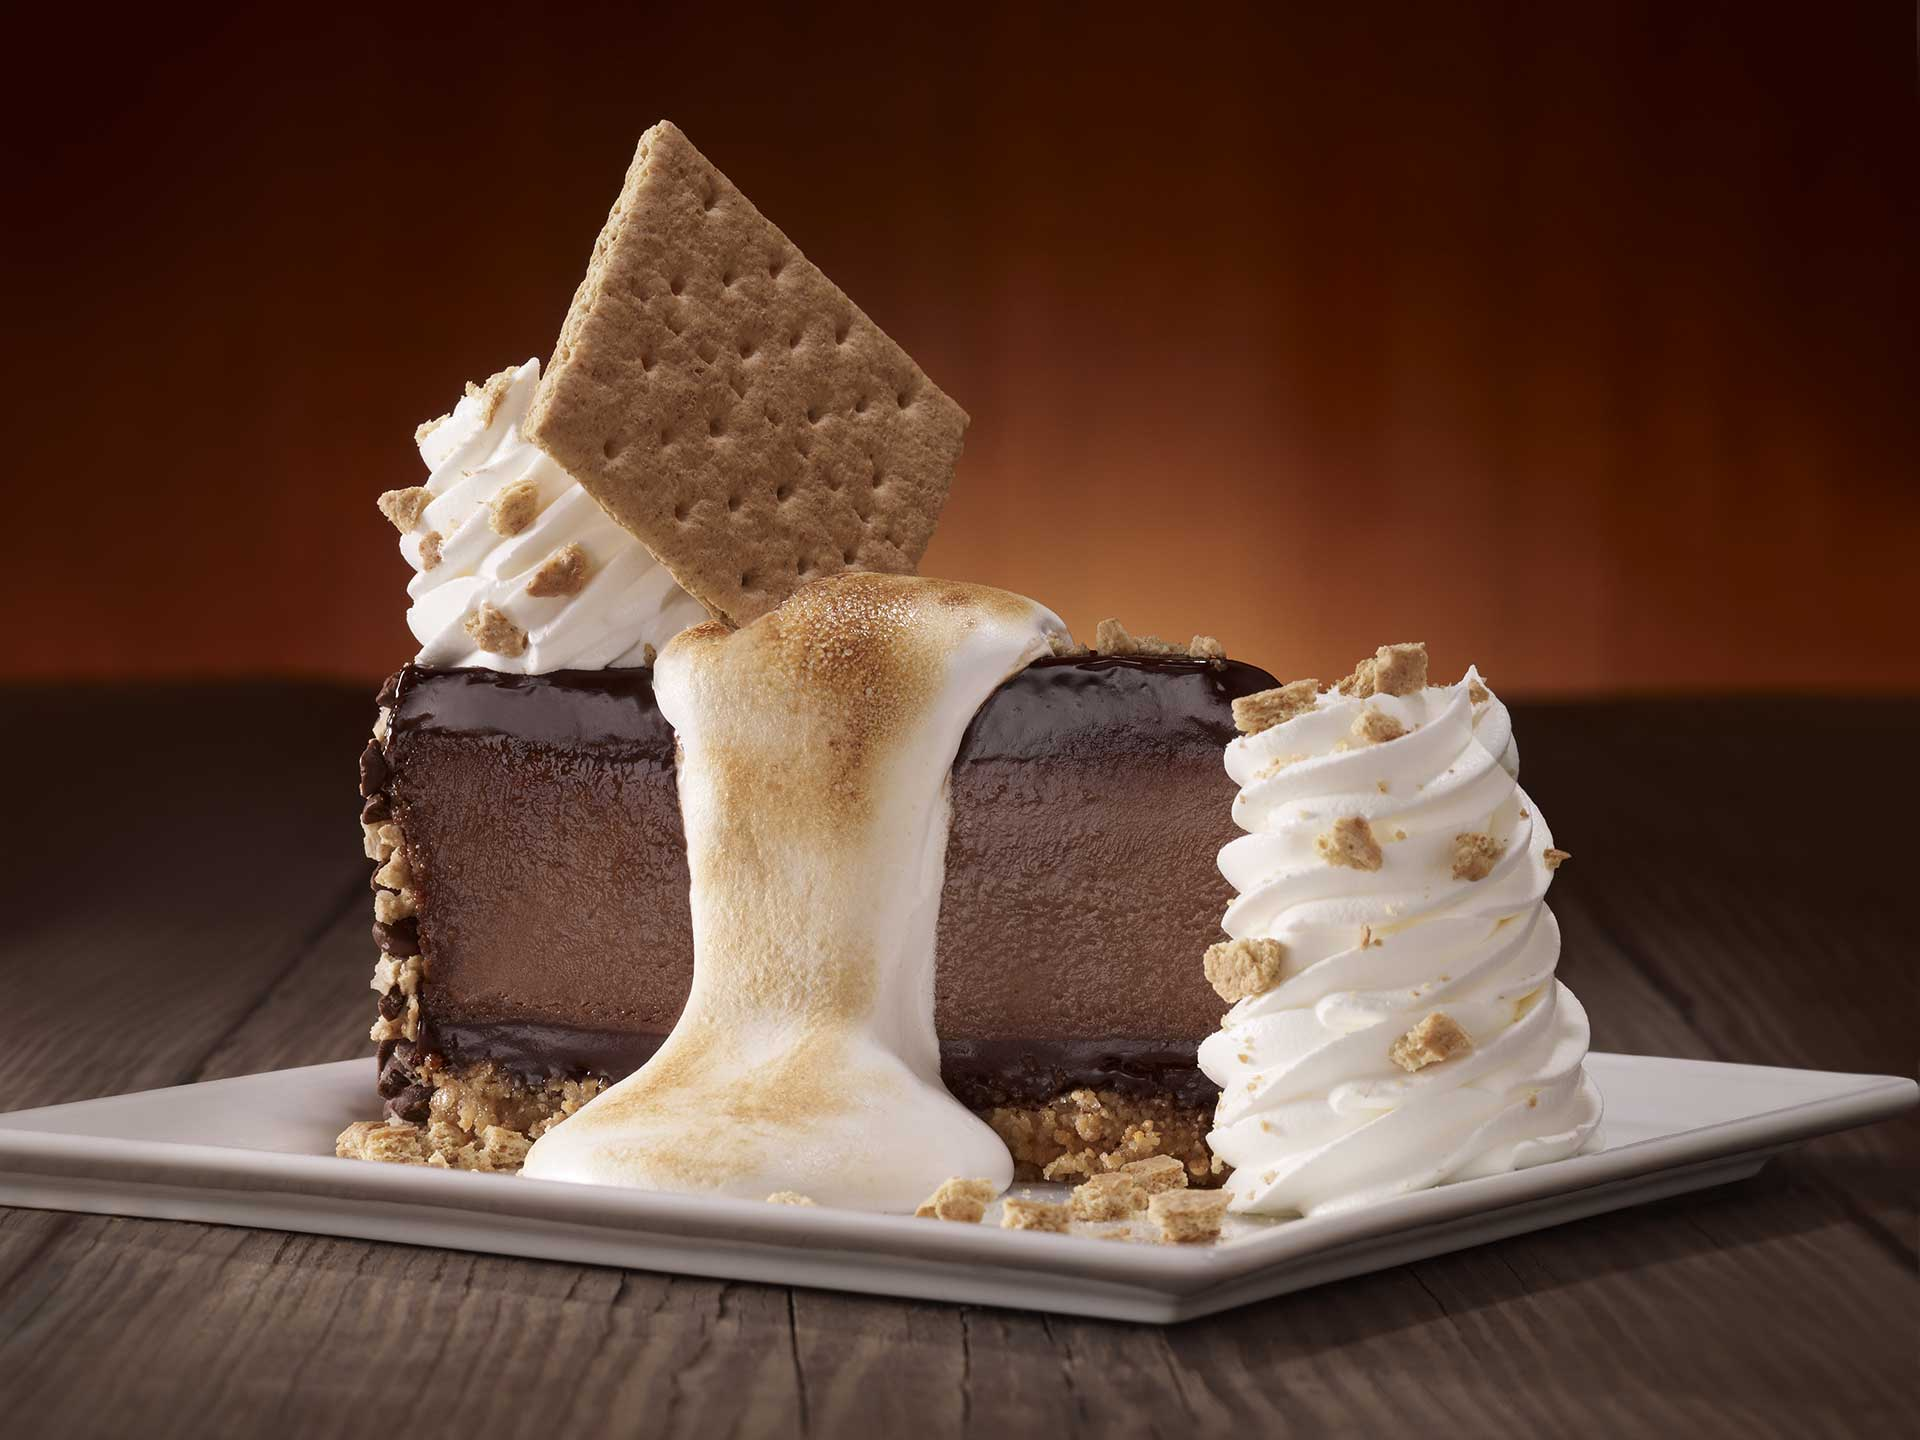 Marsmallow cheesecake